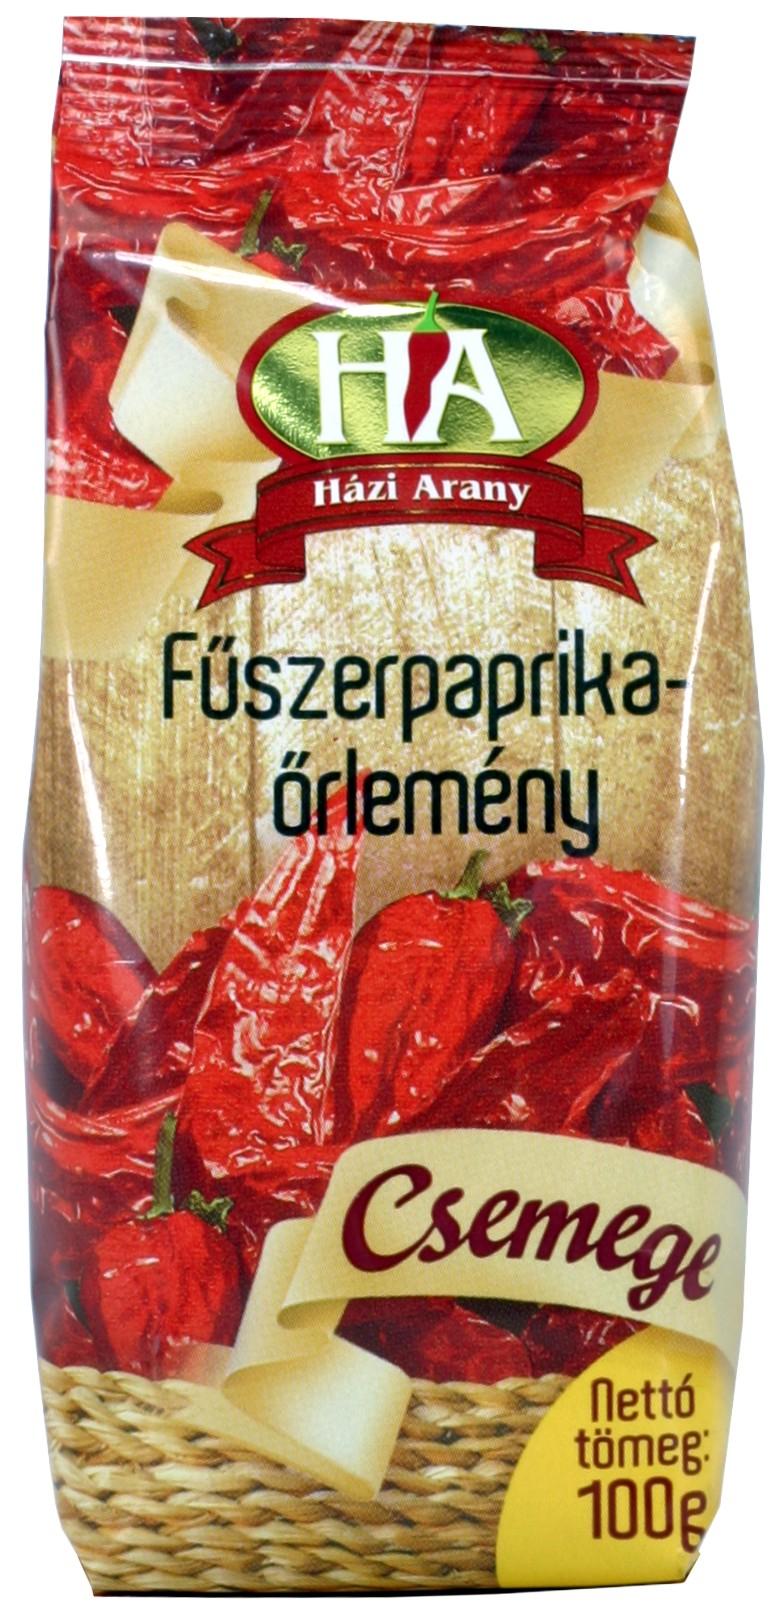 Ha paprikapulver mild aus ungarn ungarische paprika 100g for Ungarisches paprikapulver